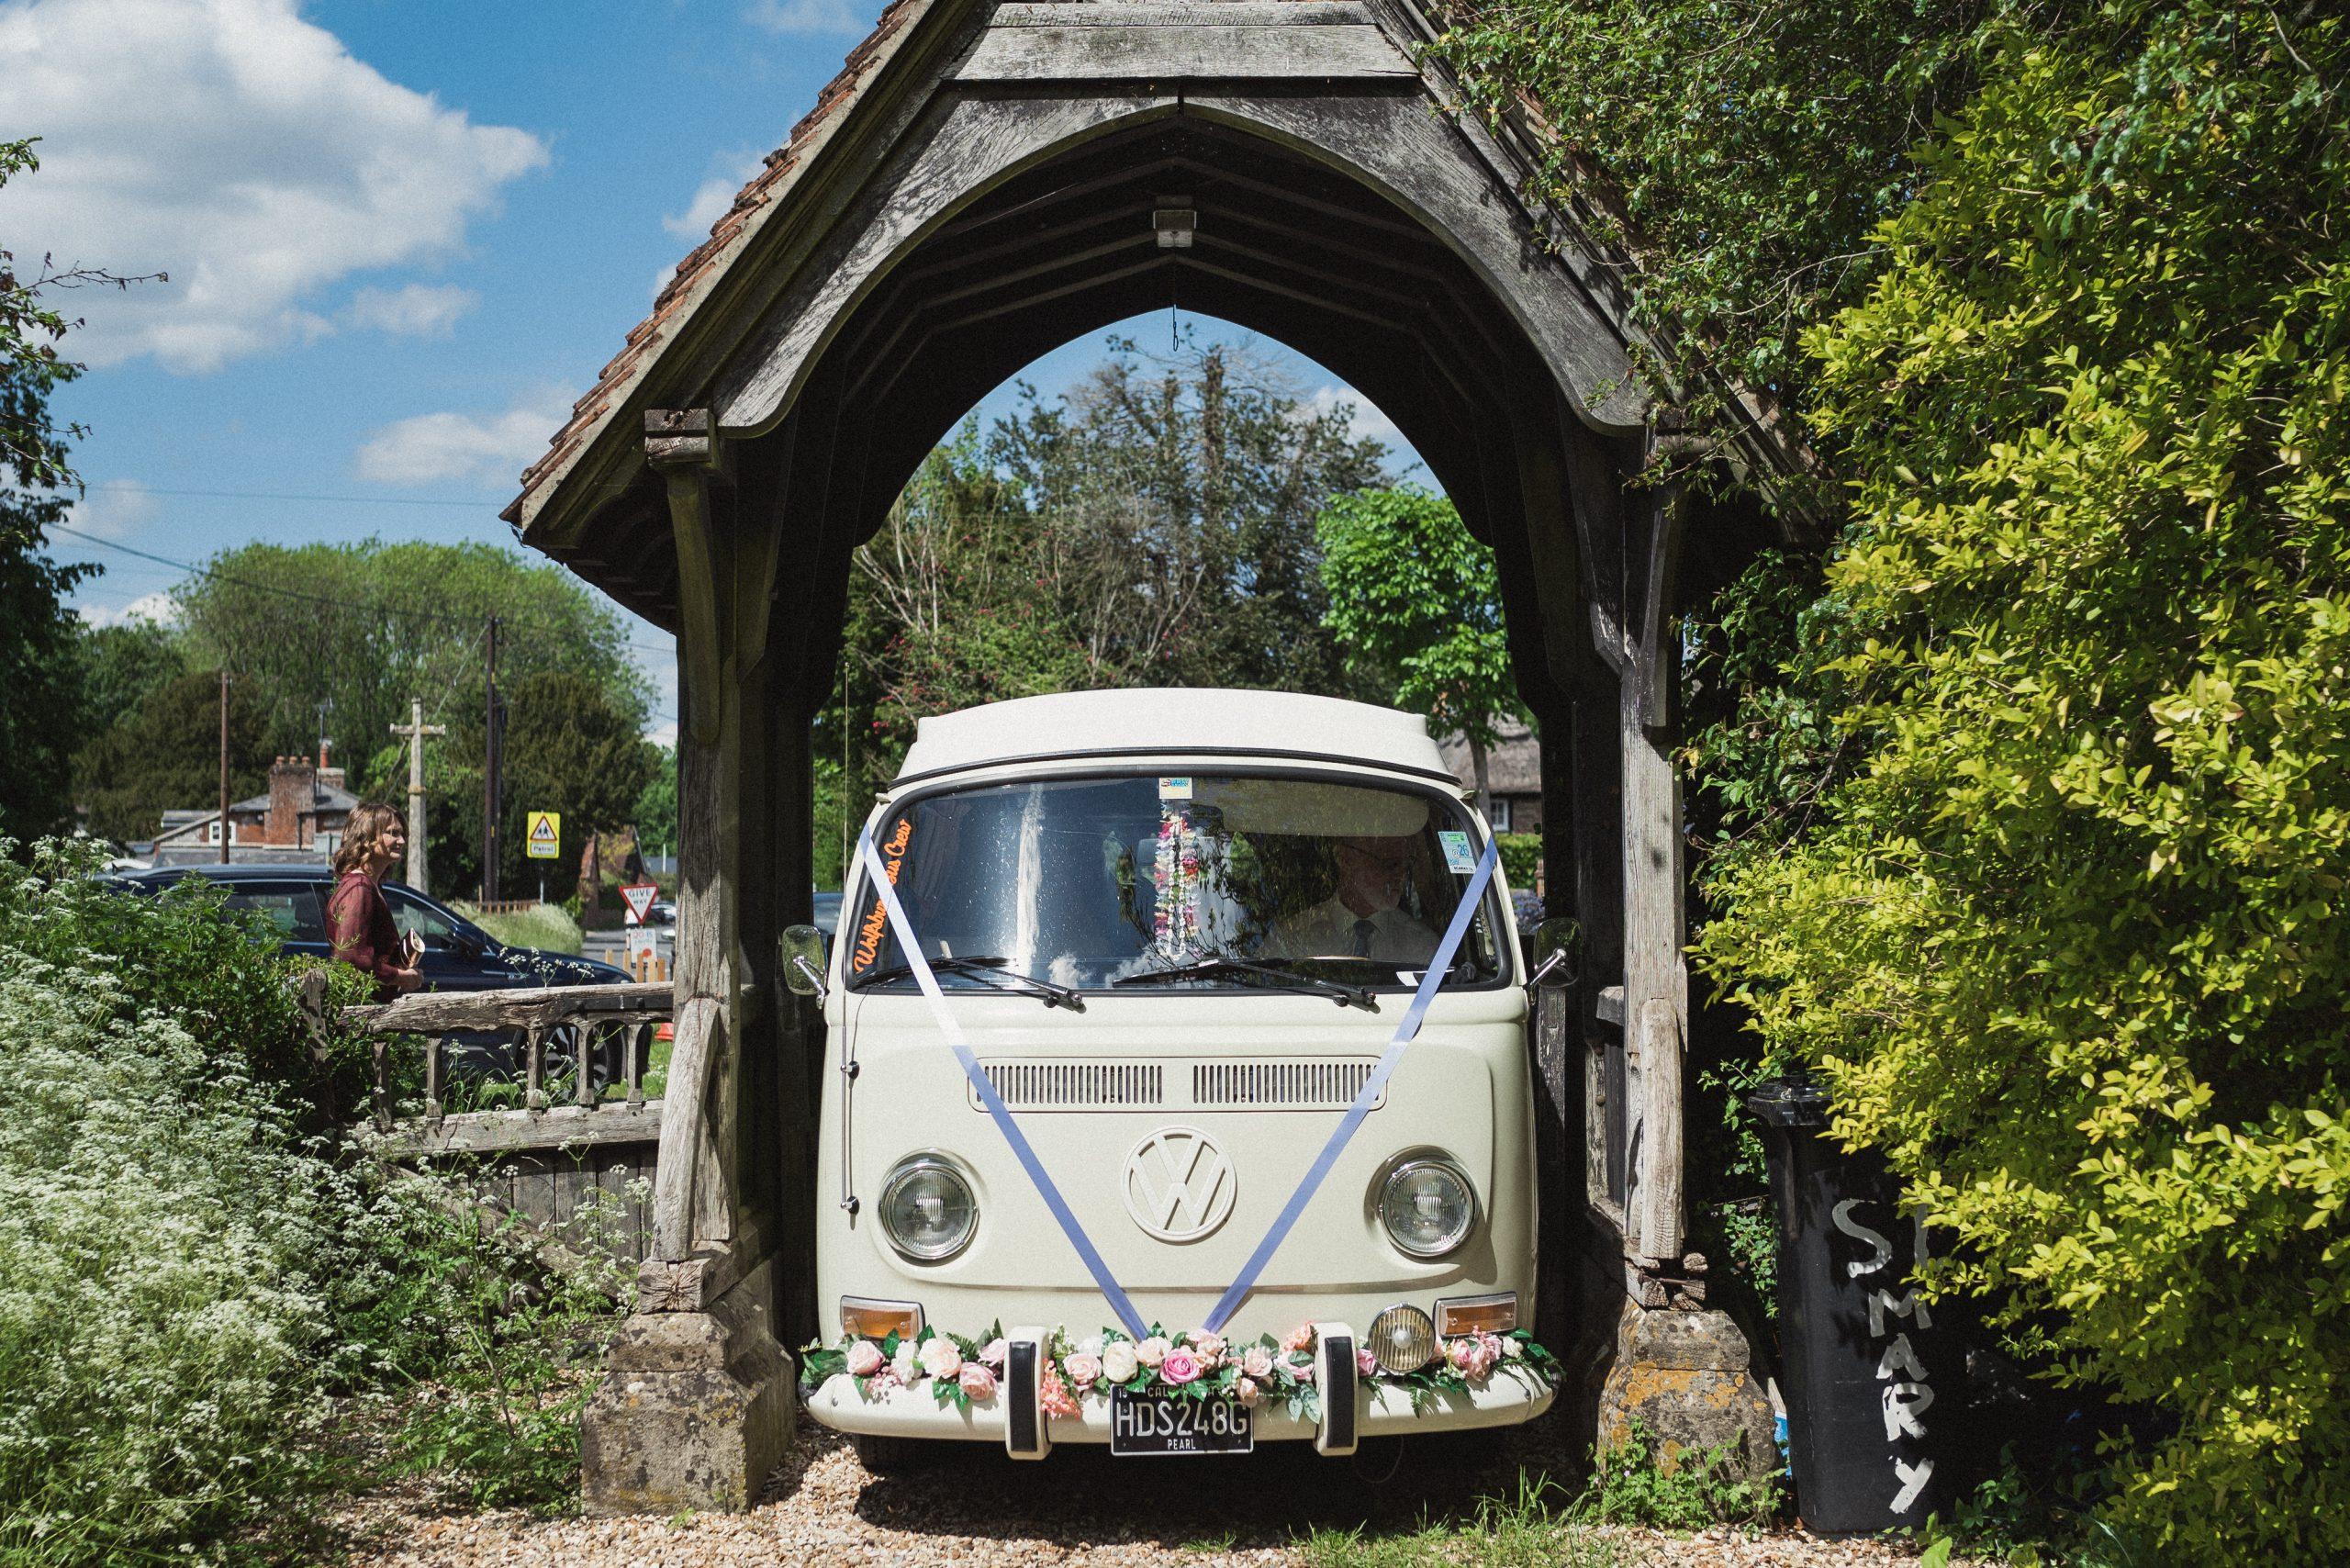 Cream camper van driving through church lychgate